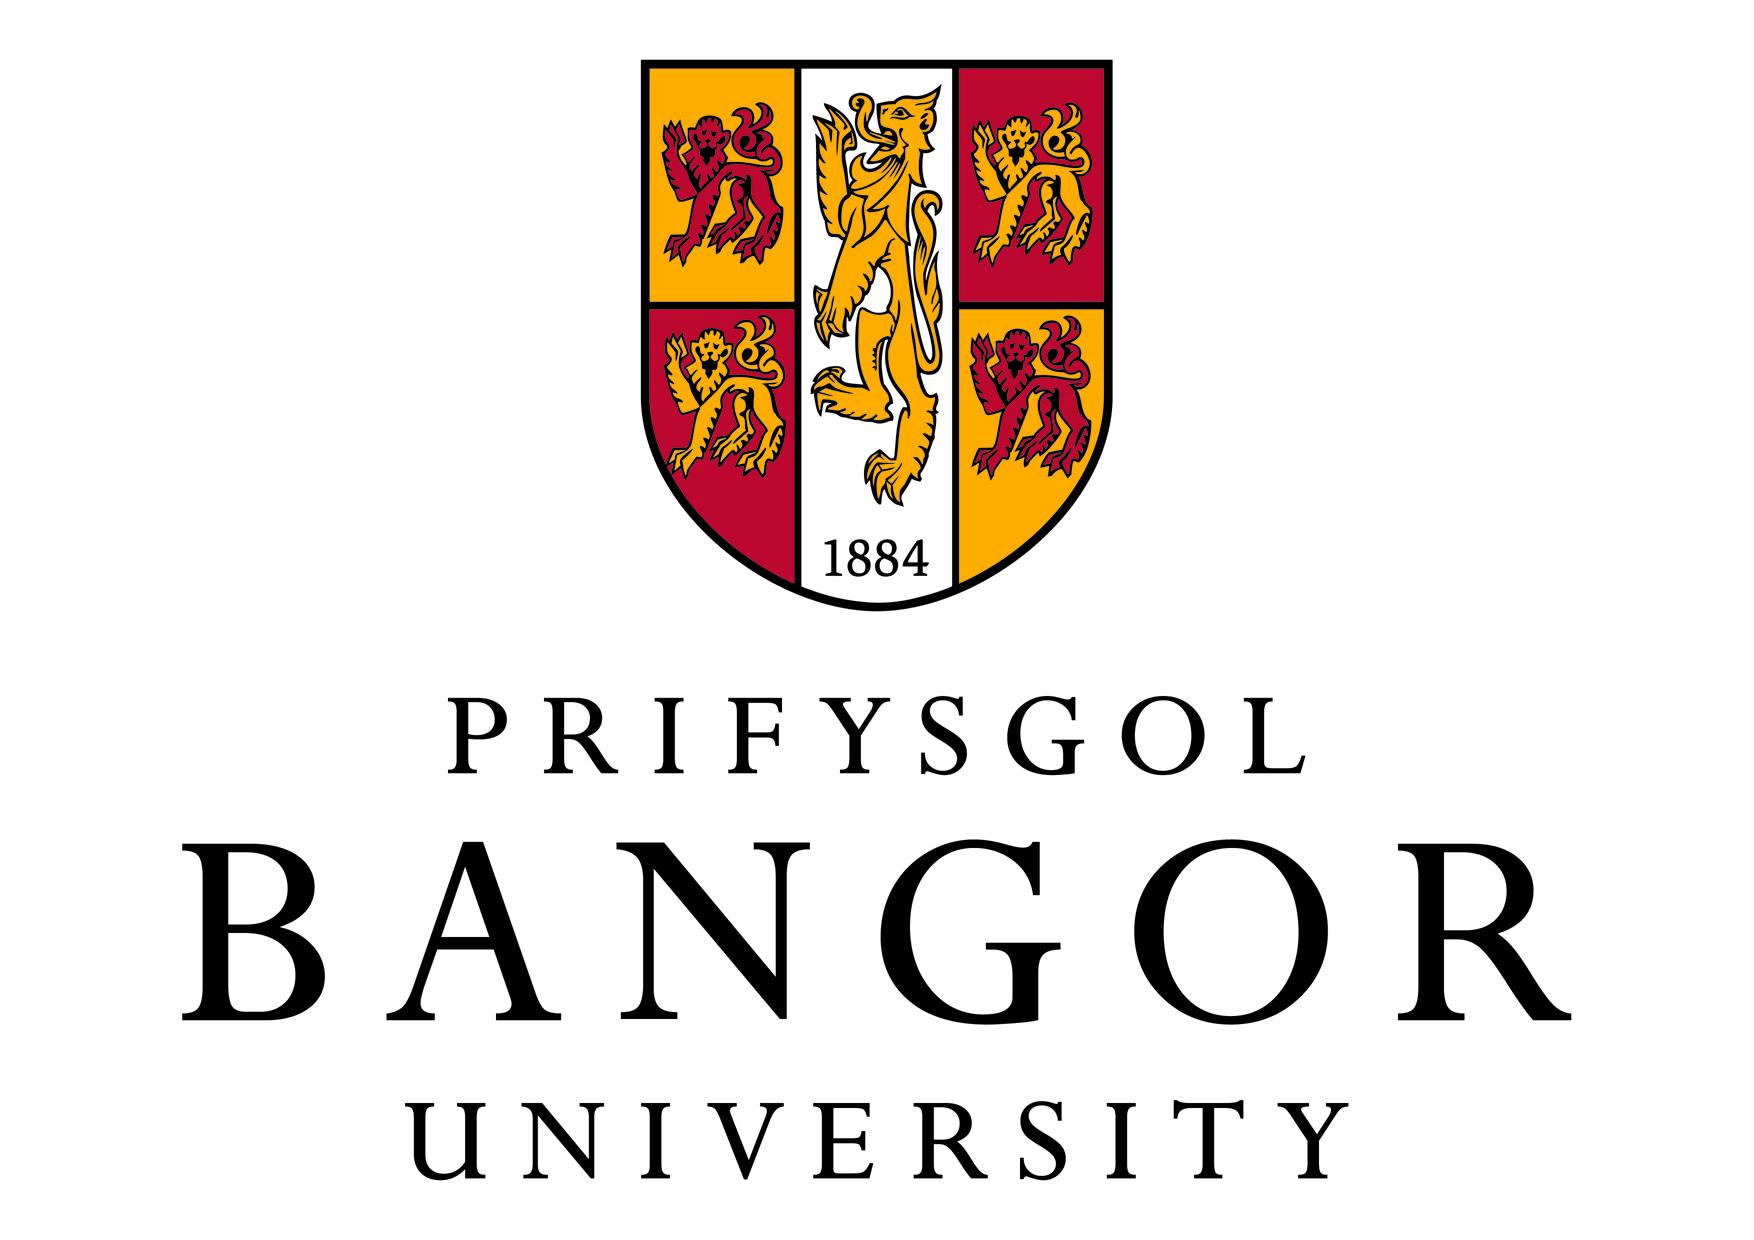 College Bangor University: Three-Year Degree